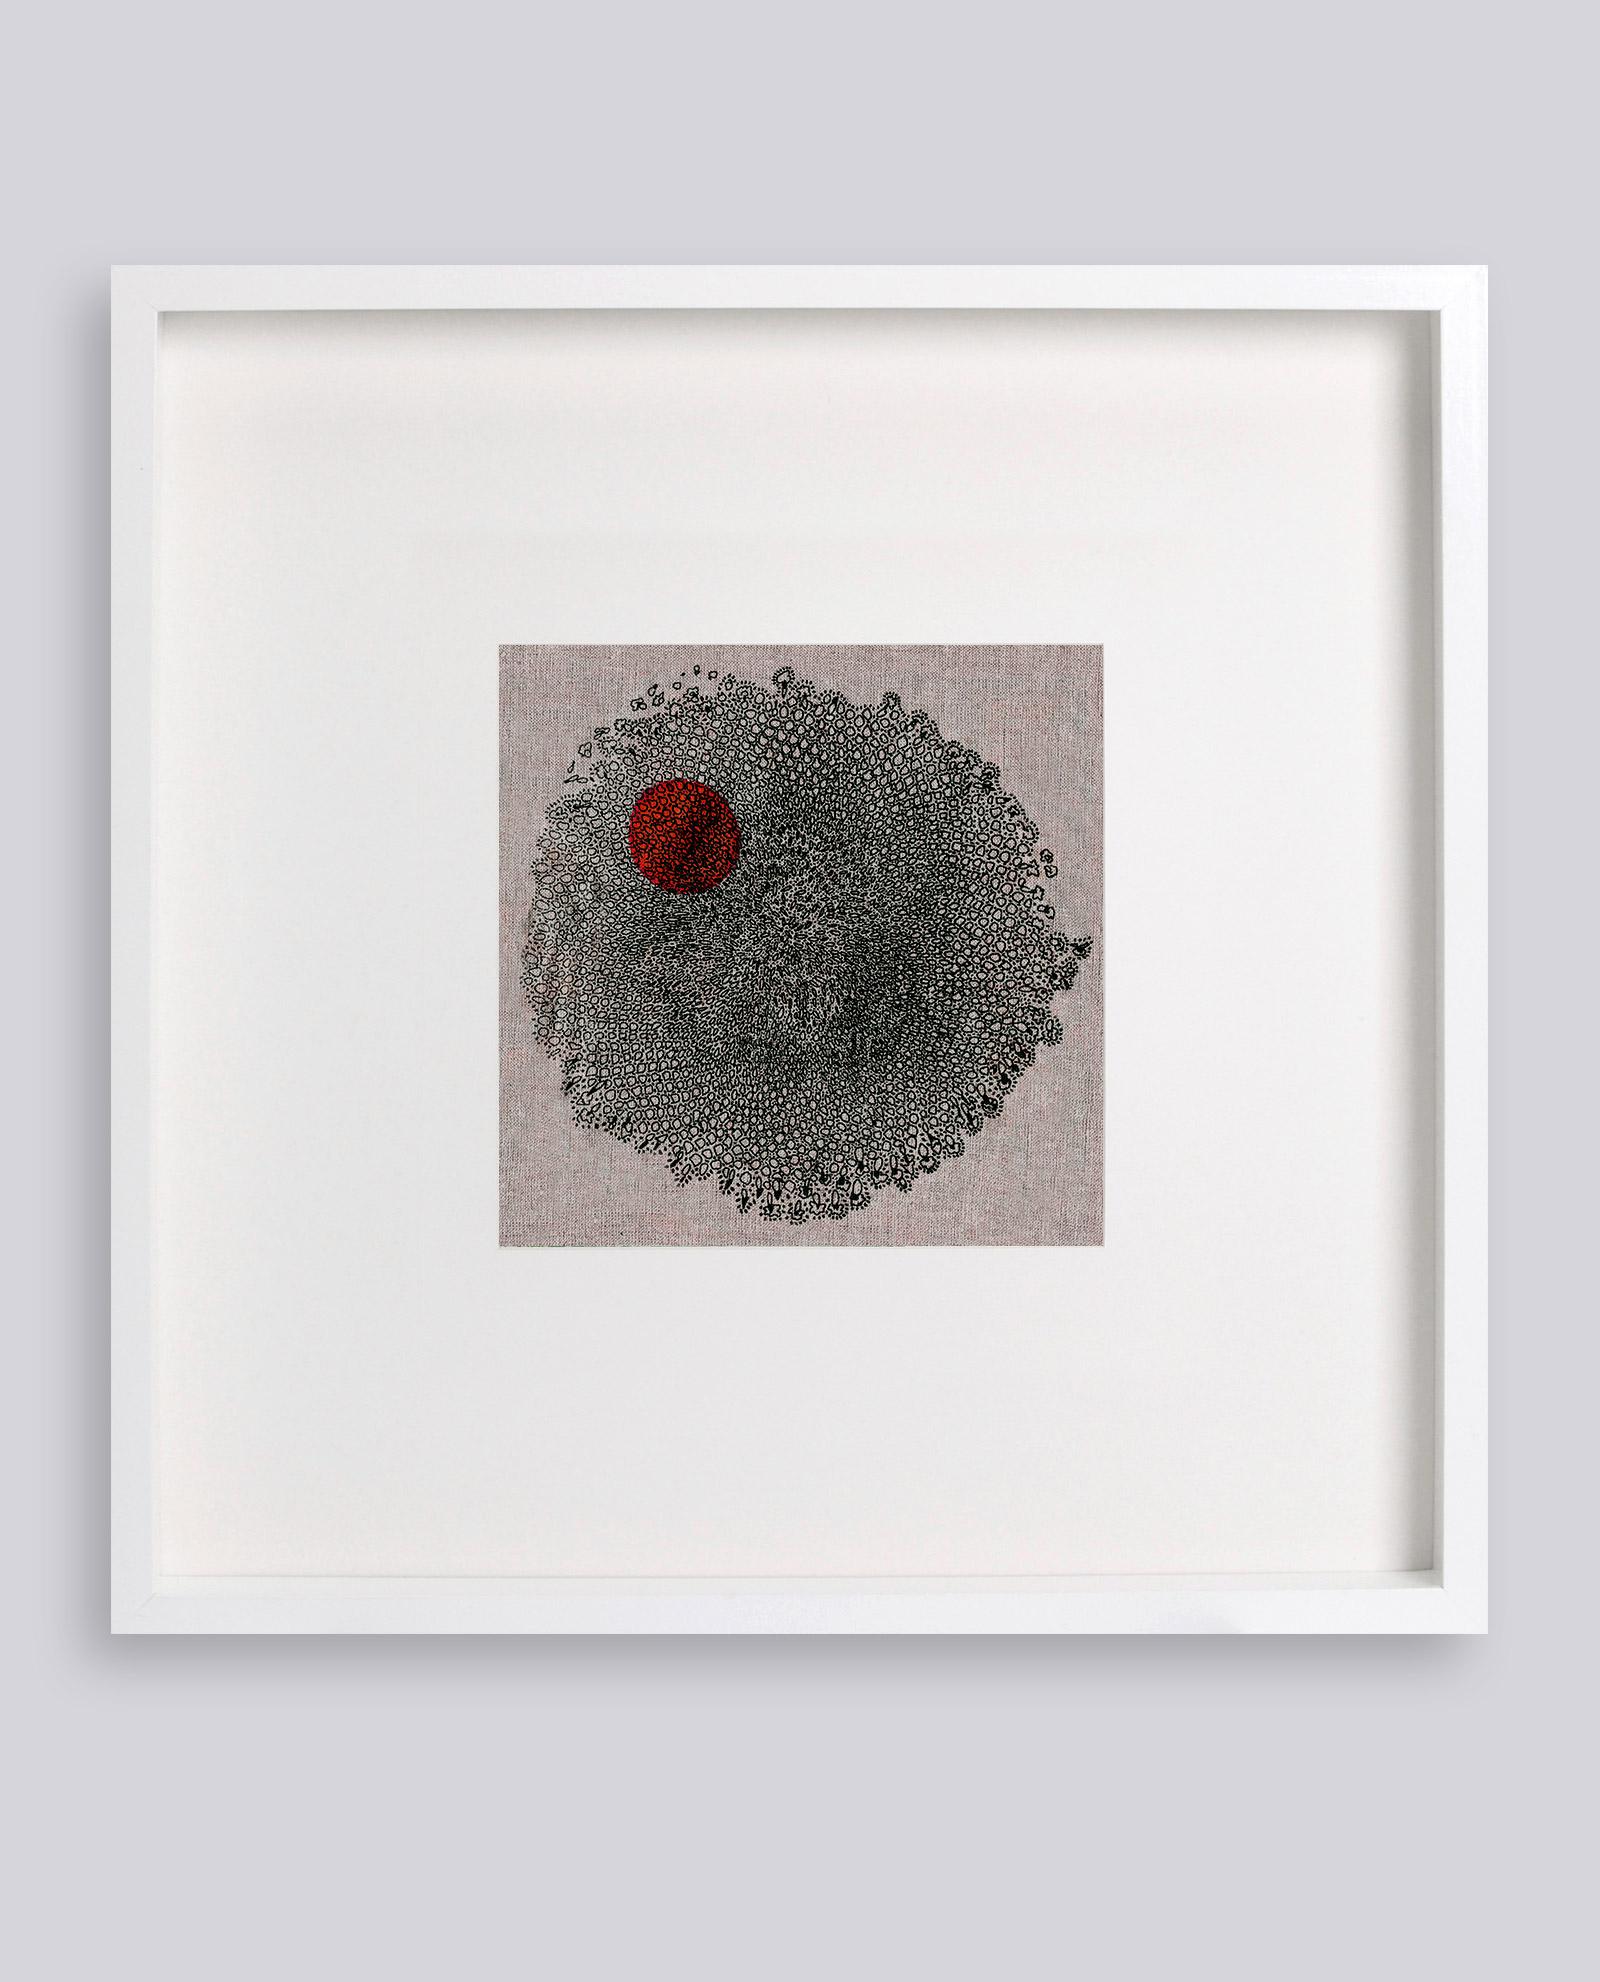 Sunflower by Martina Scott